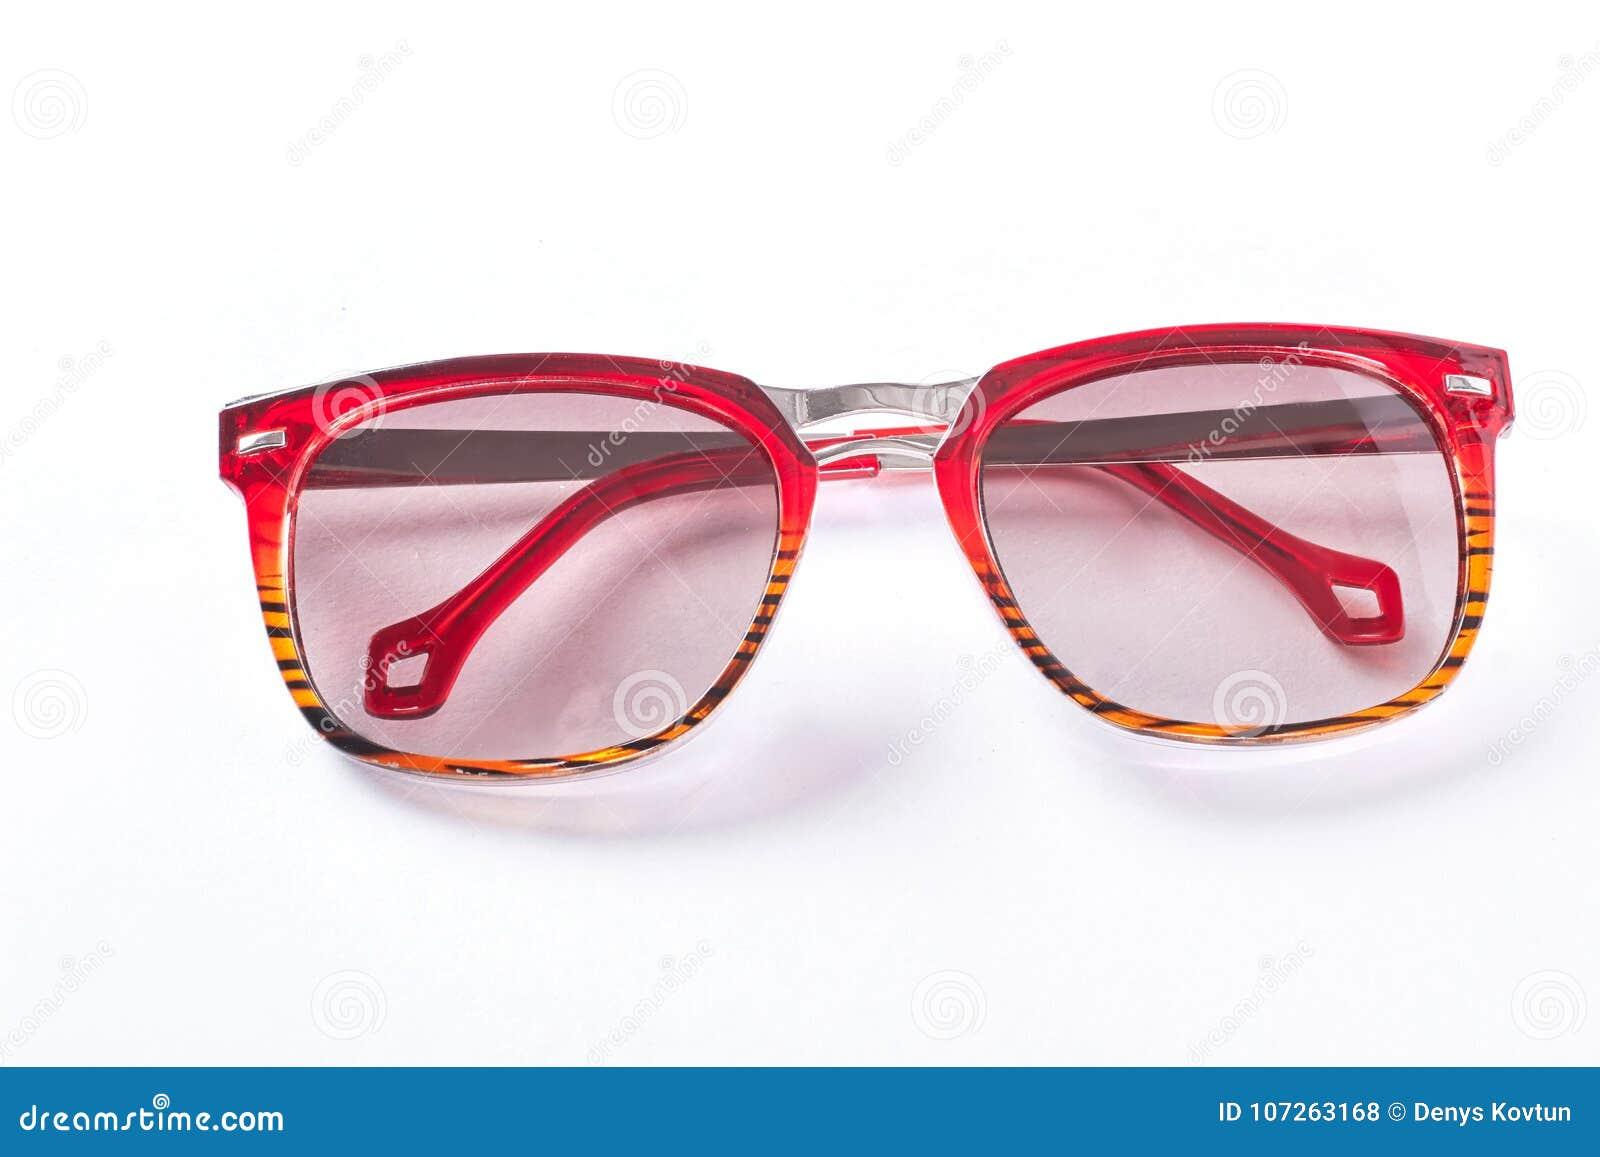 7e56ff9a2a Γυαλιά ηλίου μόδας με το κόκκινο πλαίσιο Γυαλιά ηλίου με το πλαστικό  πλαίσιο που απομονώνεται στο άσπρο υπόβαθρο Εξάρτημα Fashioin στην πώληση